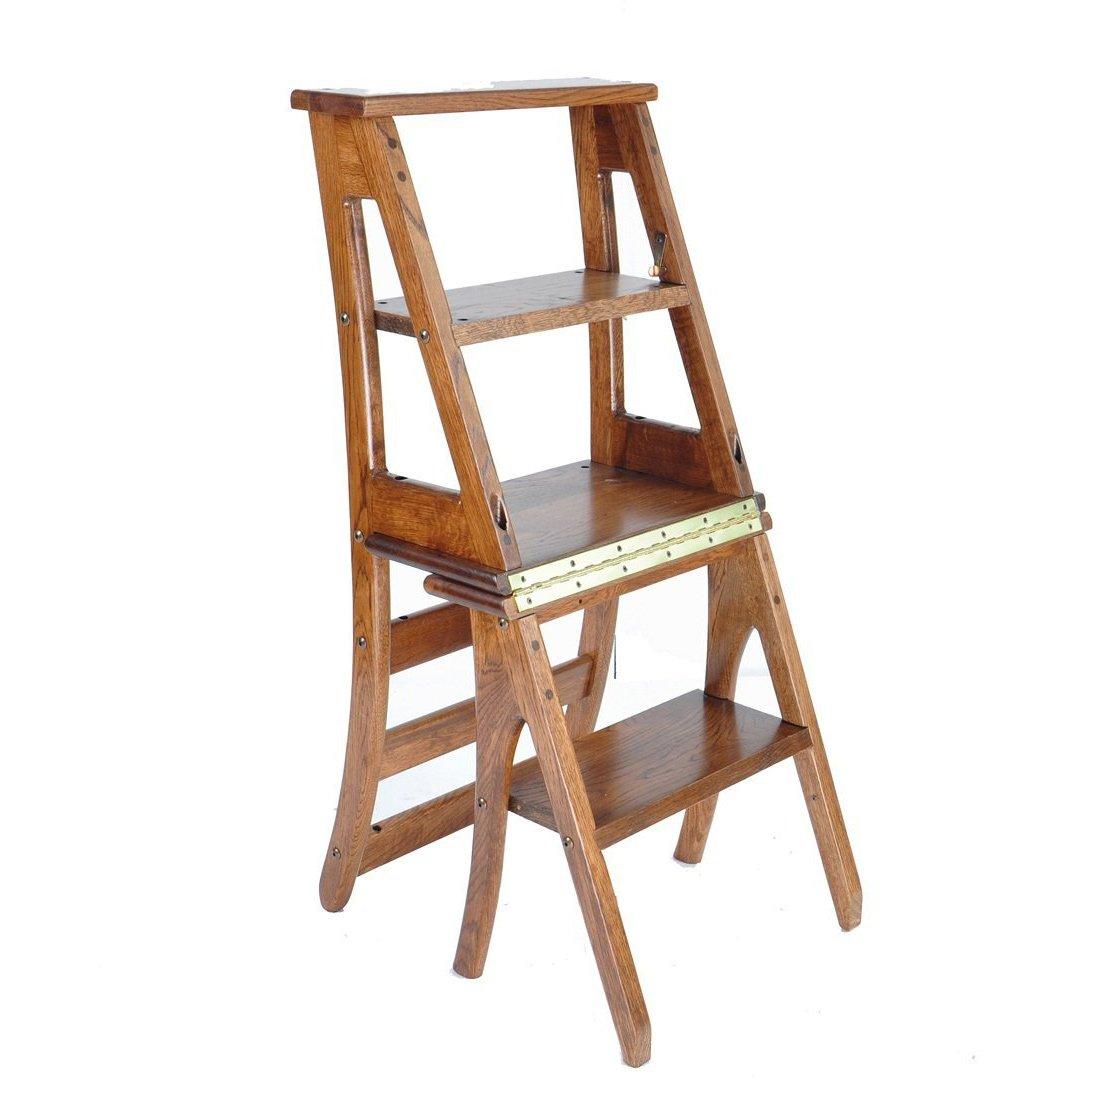 Swell Amazon Com Modern Furniture Wood Folding Ladder Chair Fold Andrewgaddart Wooden Chair Designs For Living Room Andrewgaddartcom